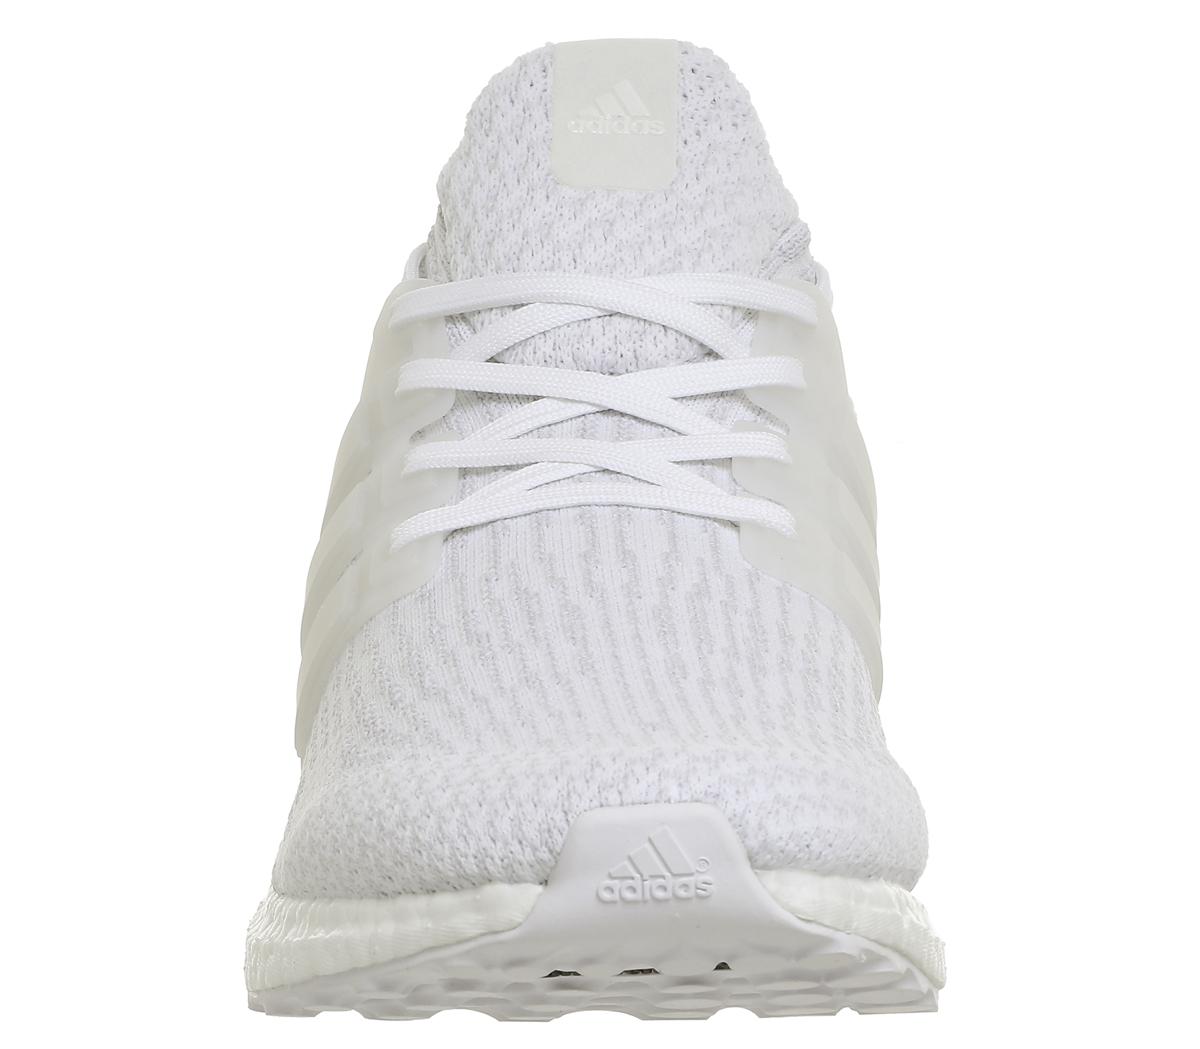 bb8725b579027 SENTINEL Scarpe da uomo Adidas Ultra Boost formatori MONO bianco bianco